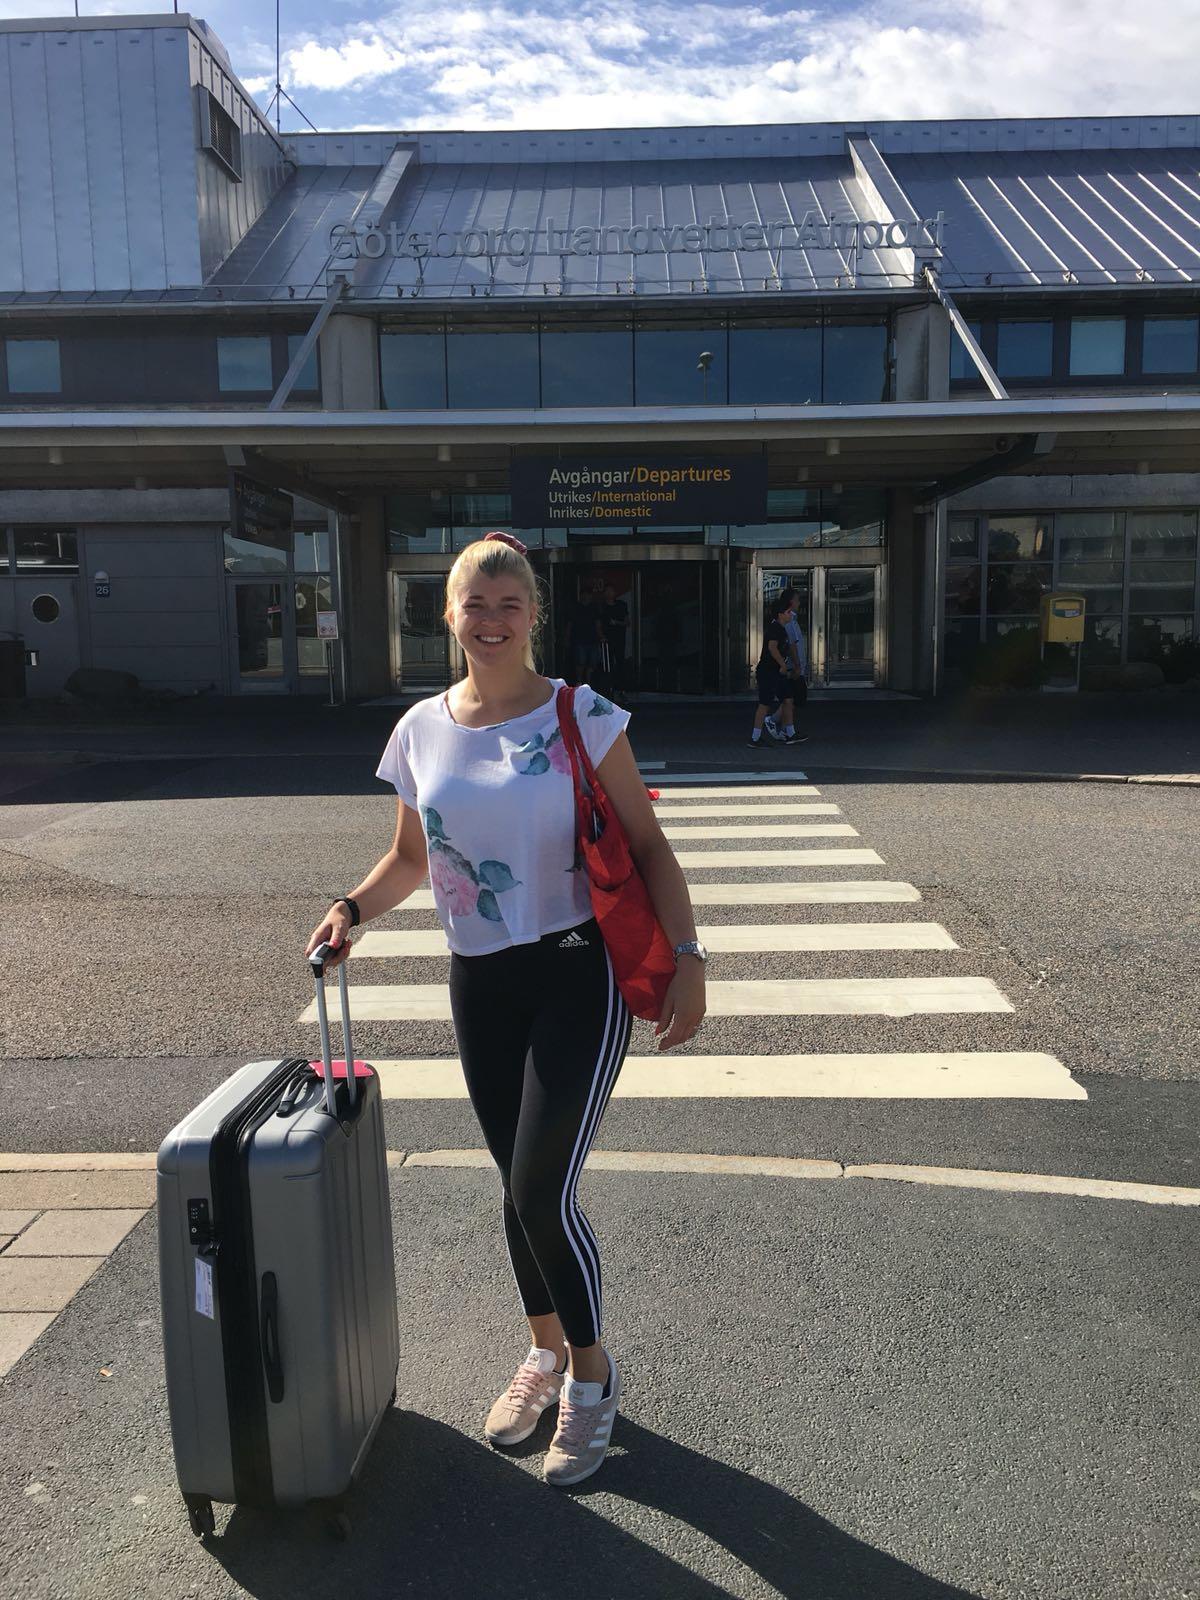 Linn Stenholm Fitness vacation Airpo0rt